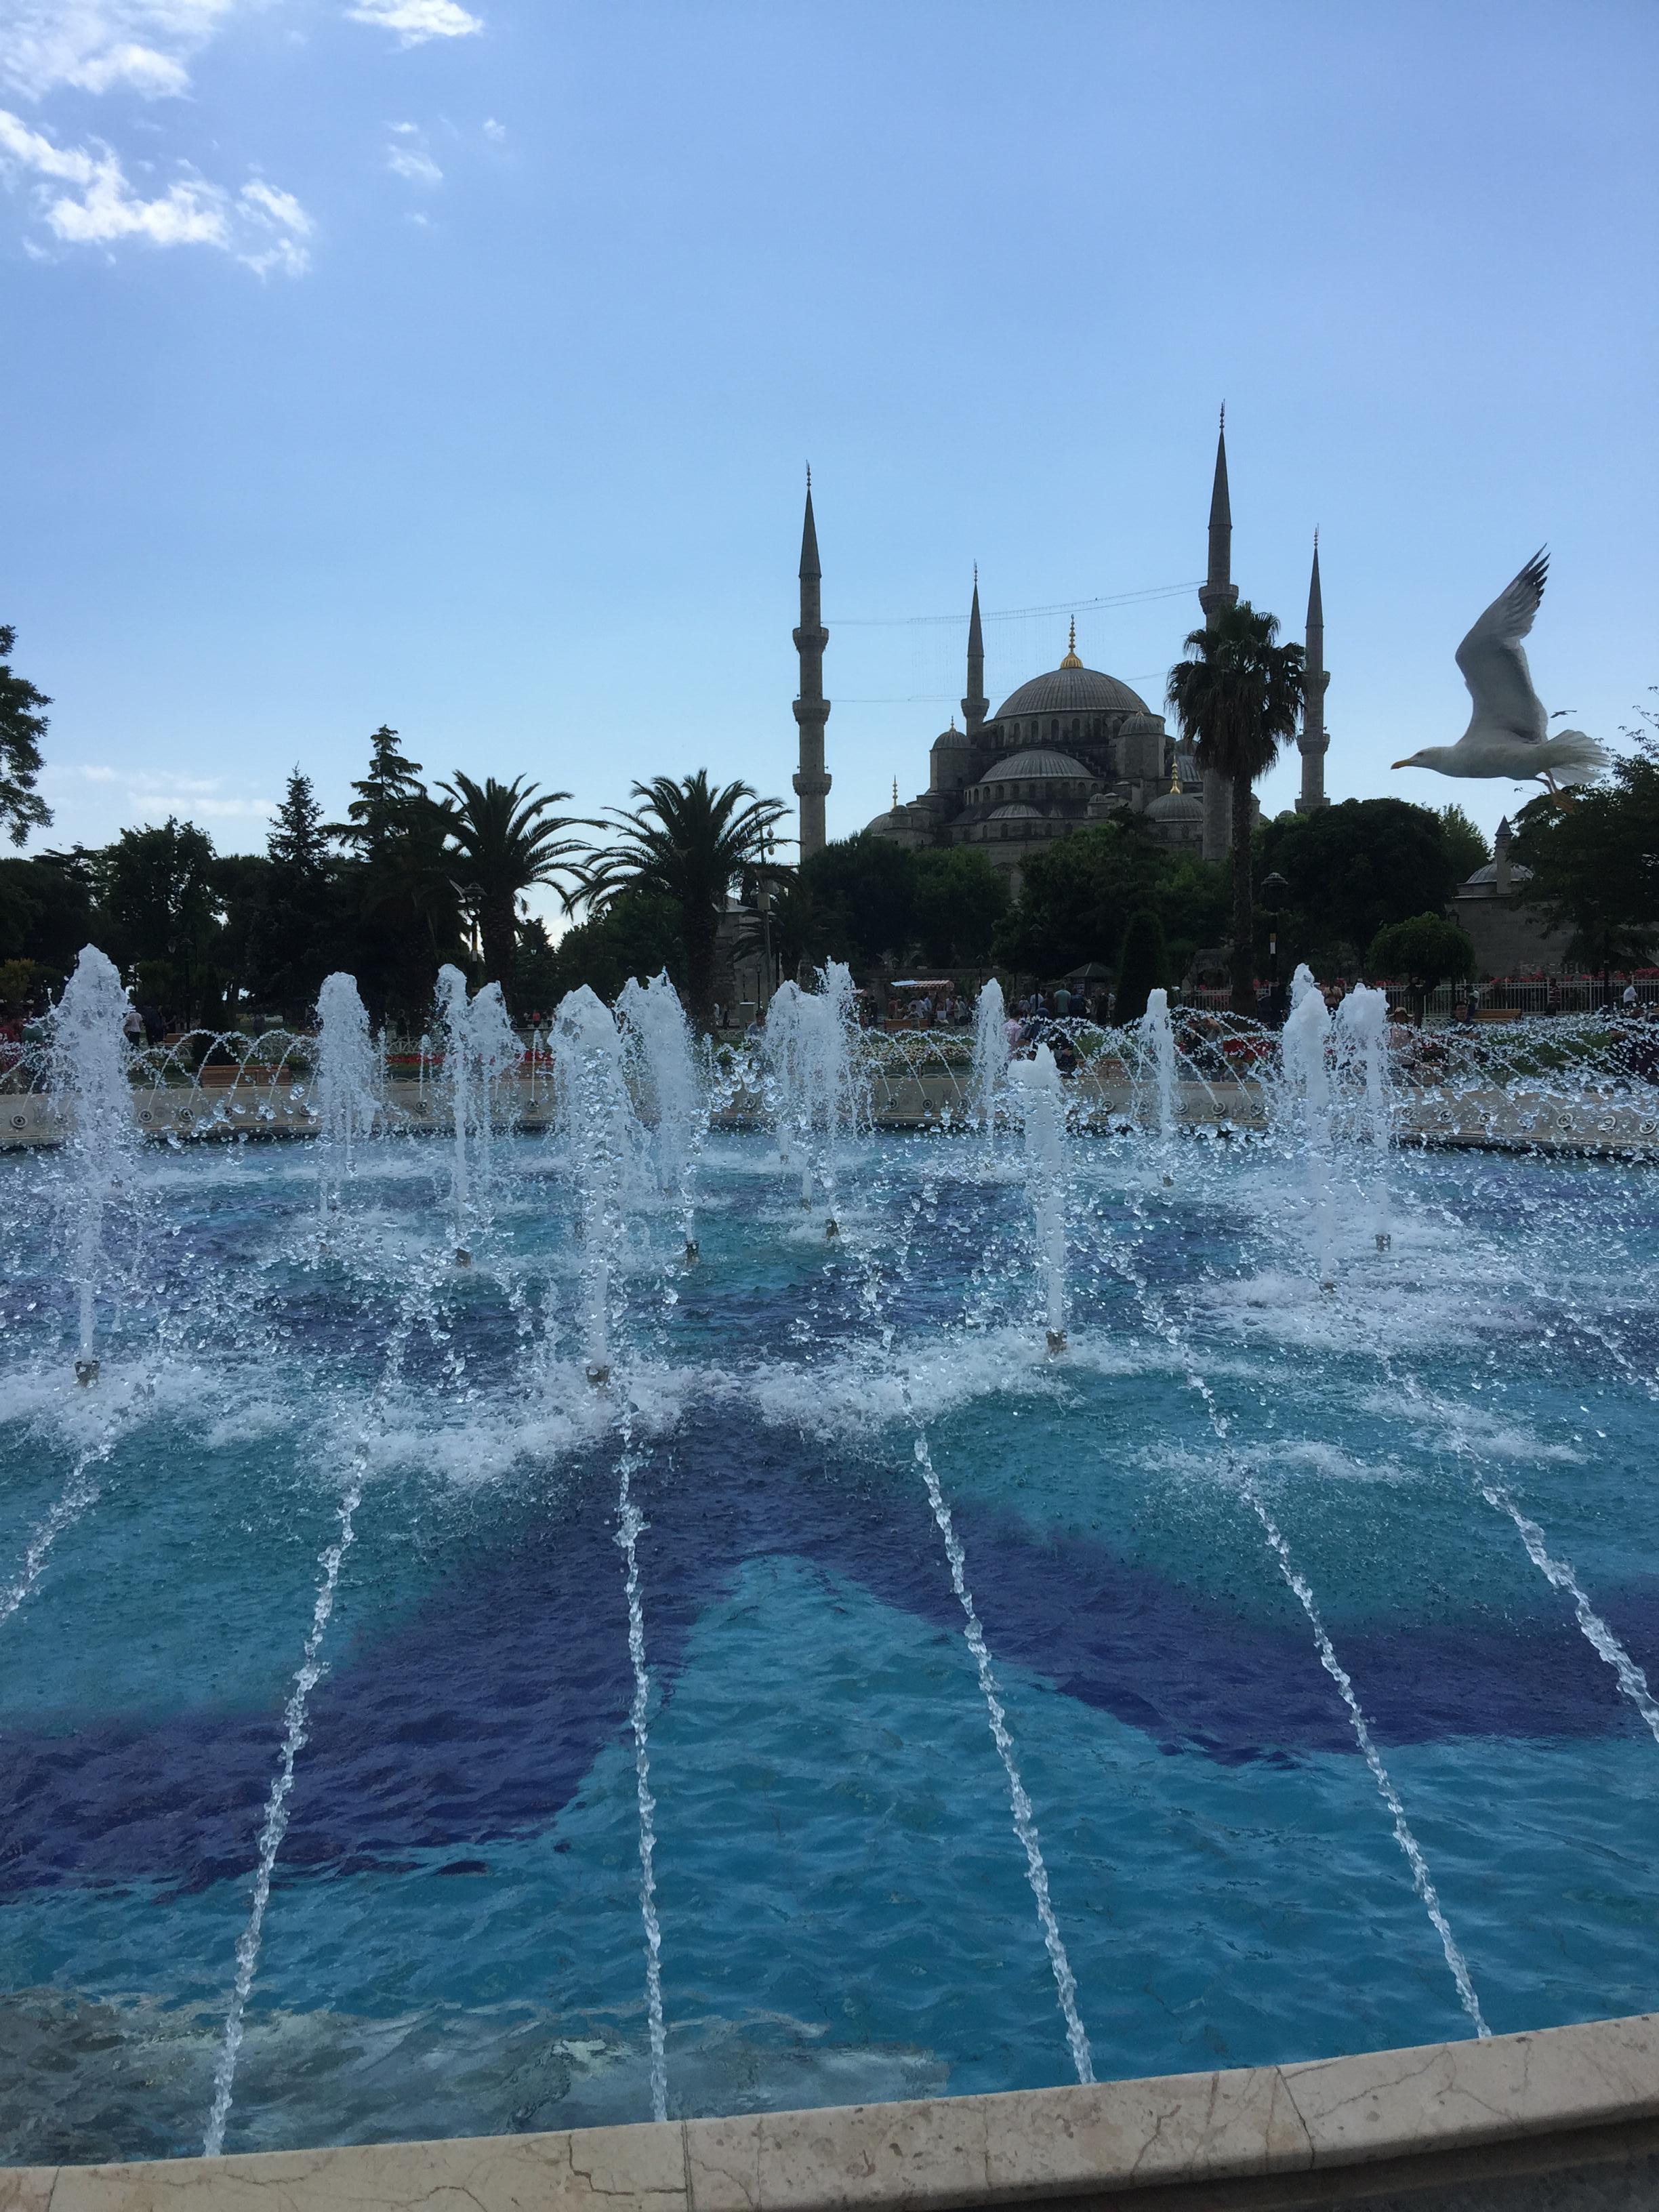 Aromatic Turkish Teas